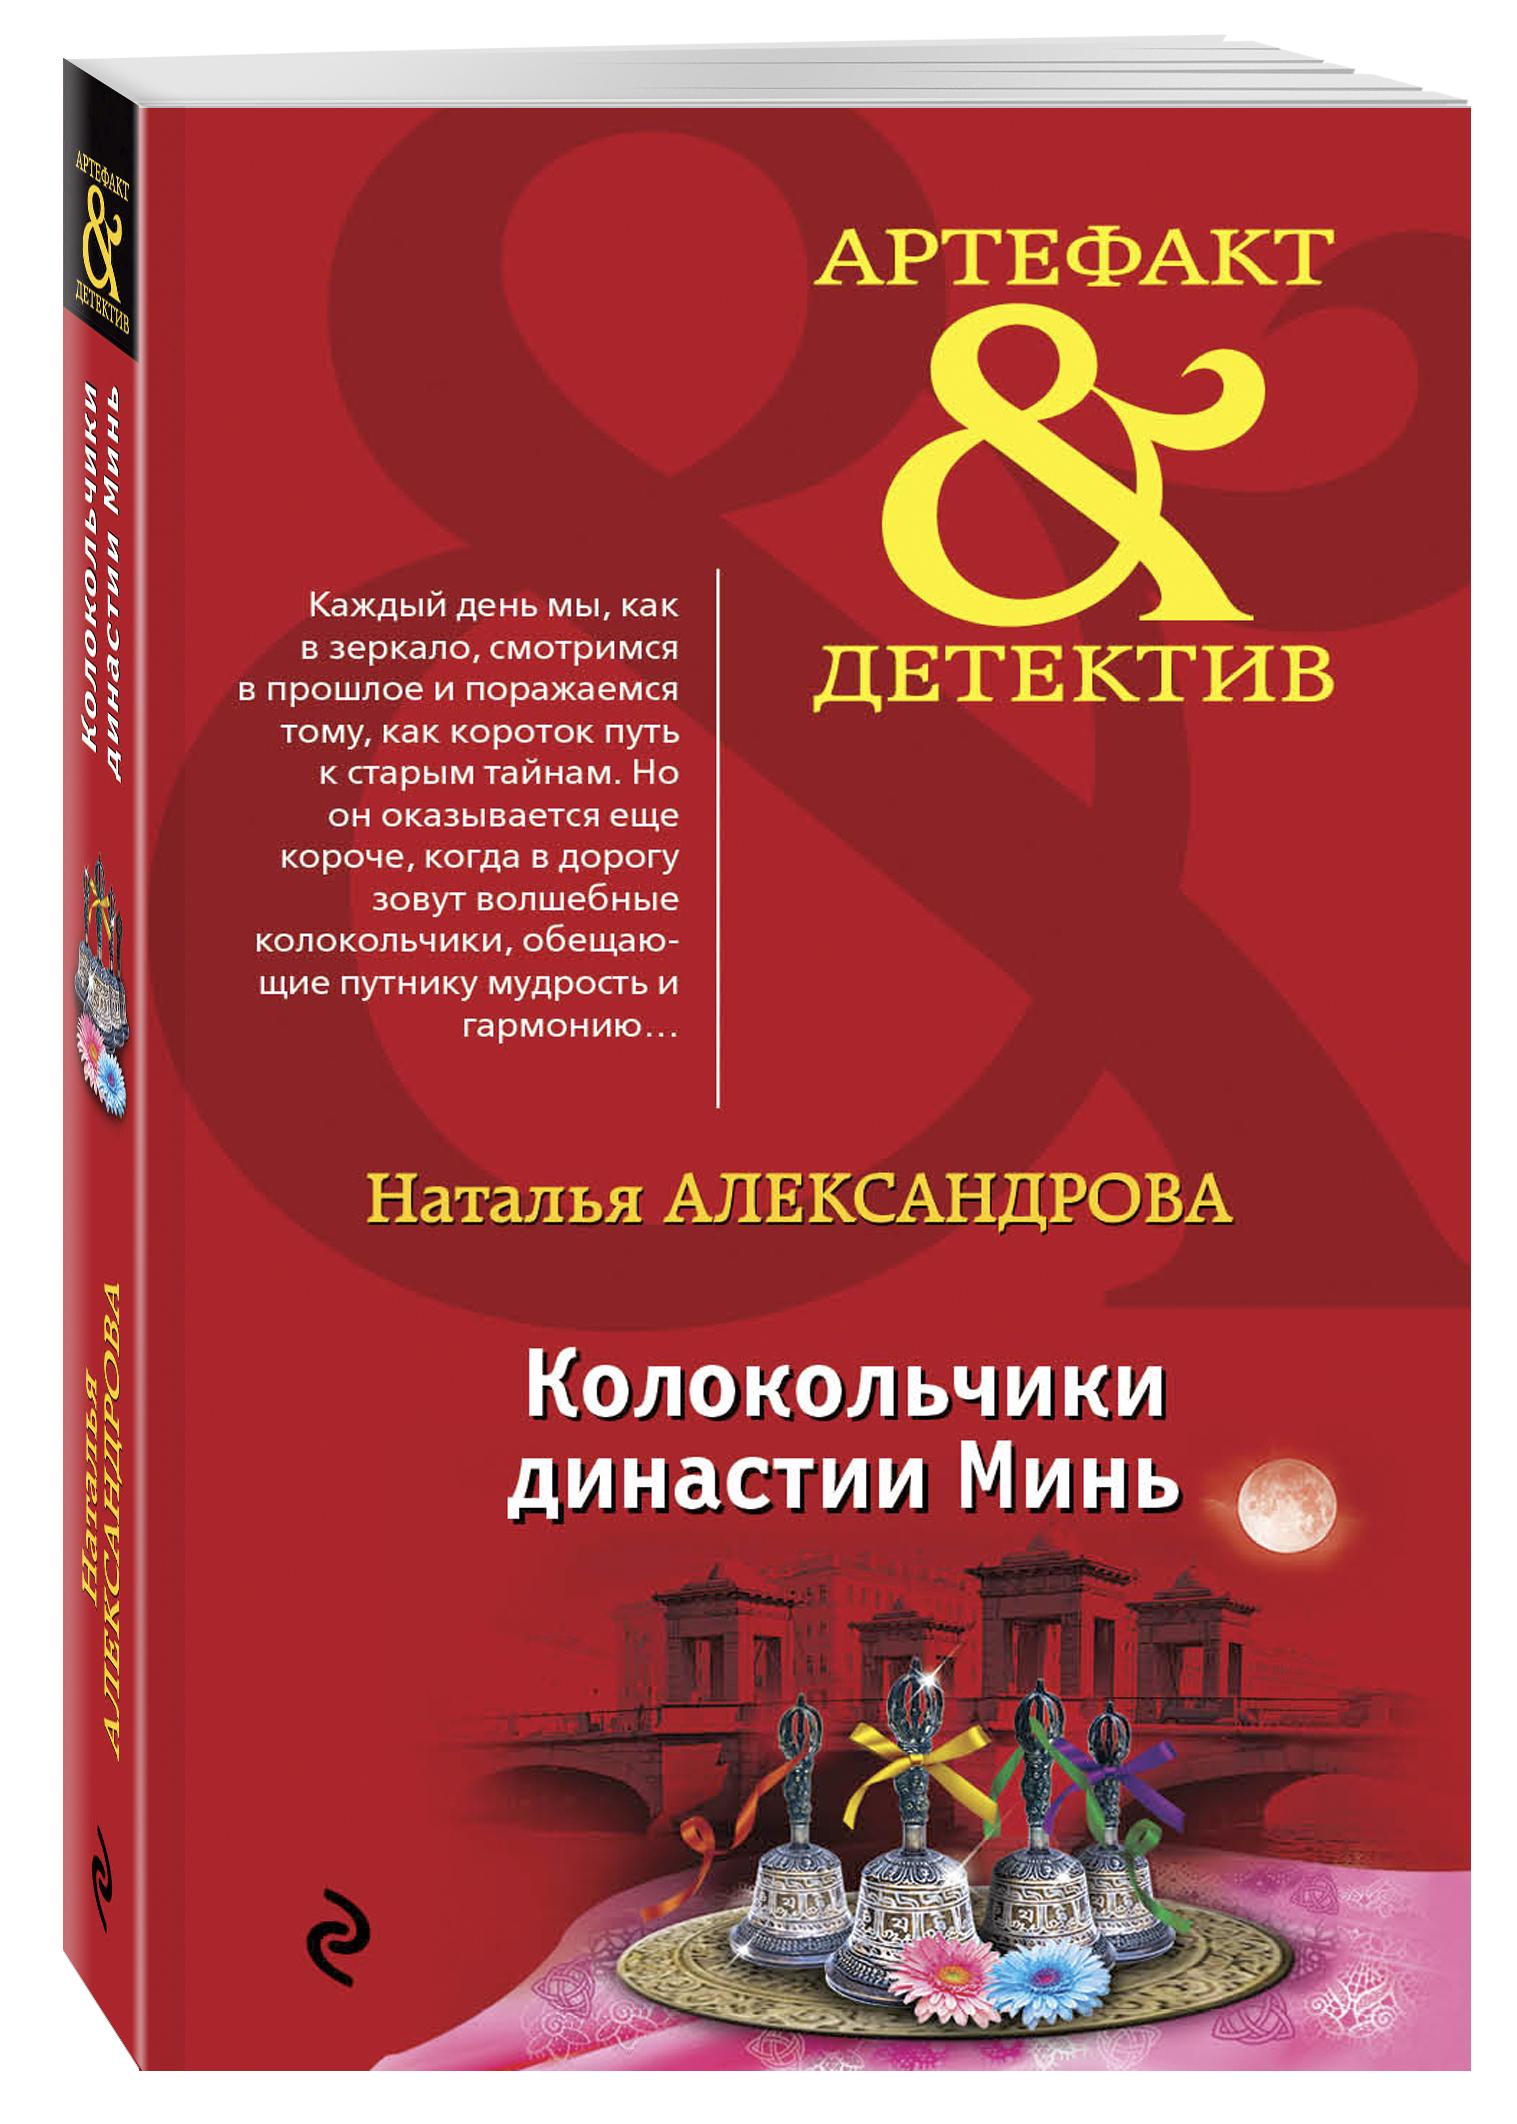 Наталья Александрова Колокольчики династии Минь